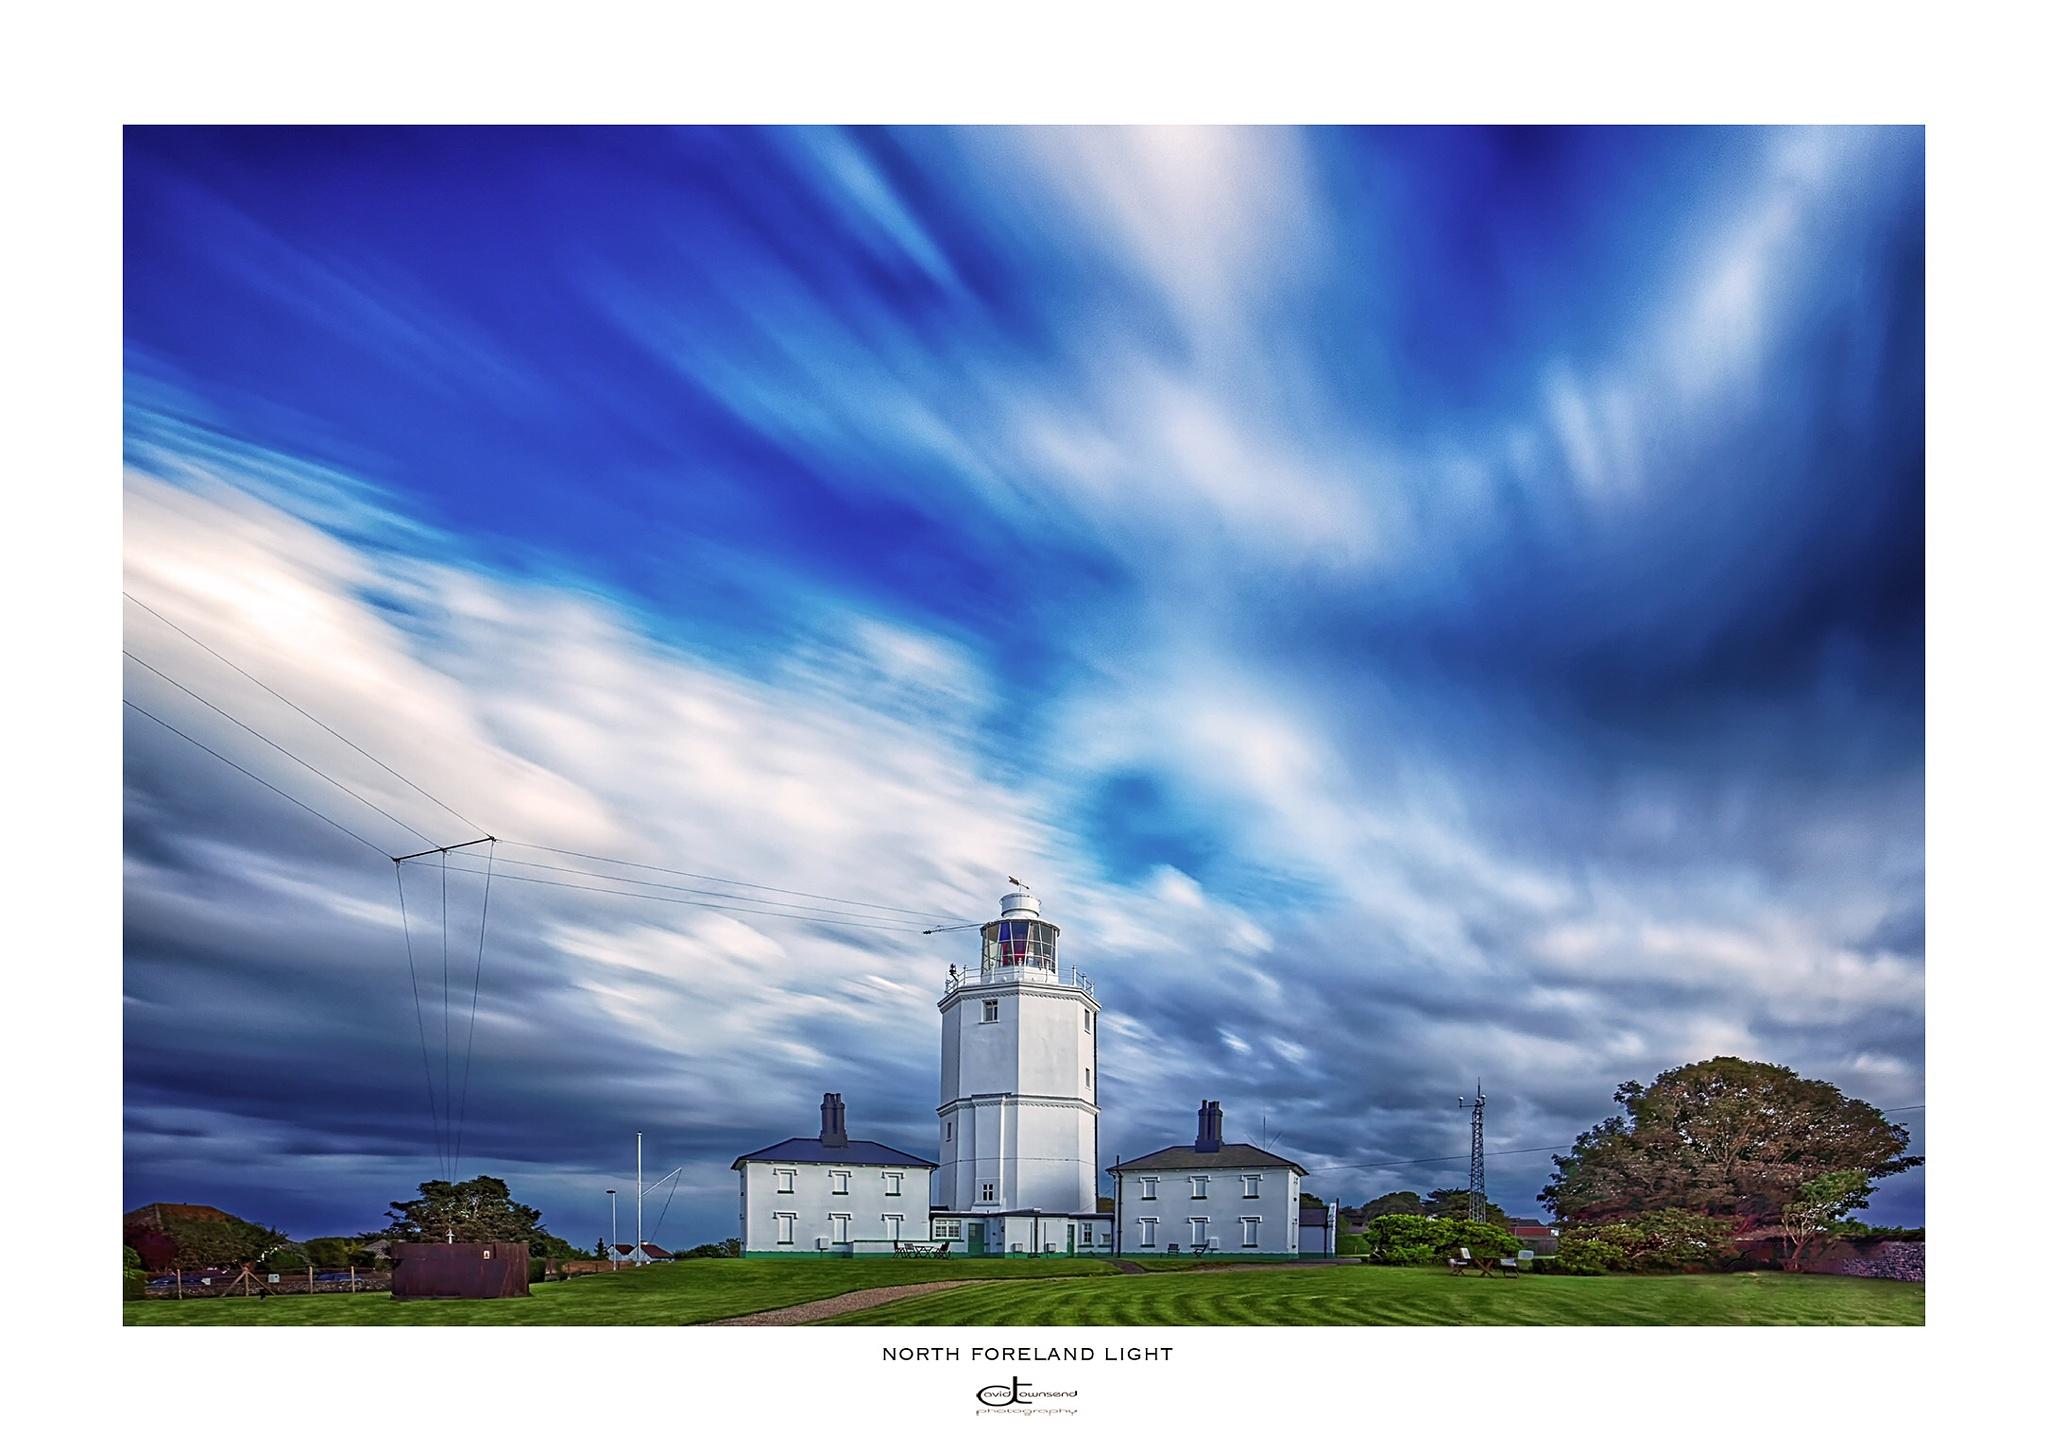 Lighthouse, landscape, architecture, by David Townsend